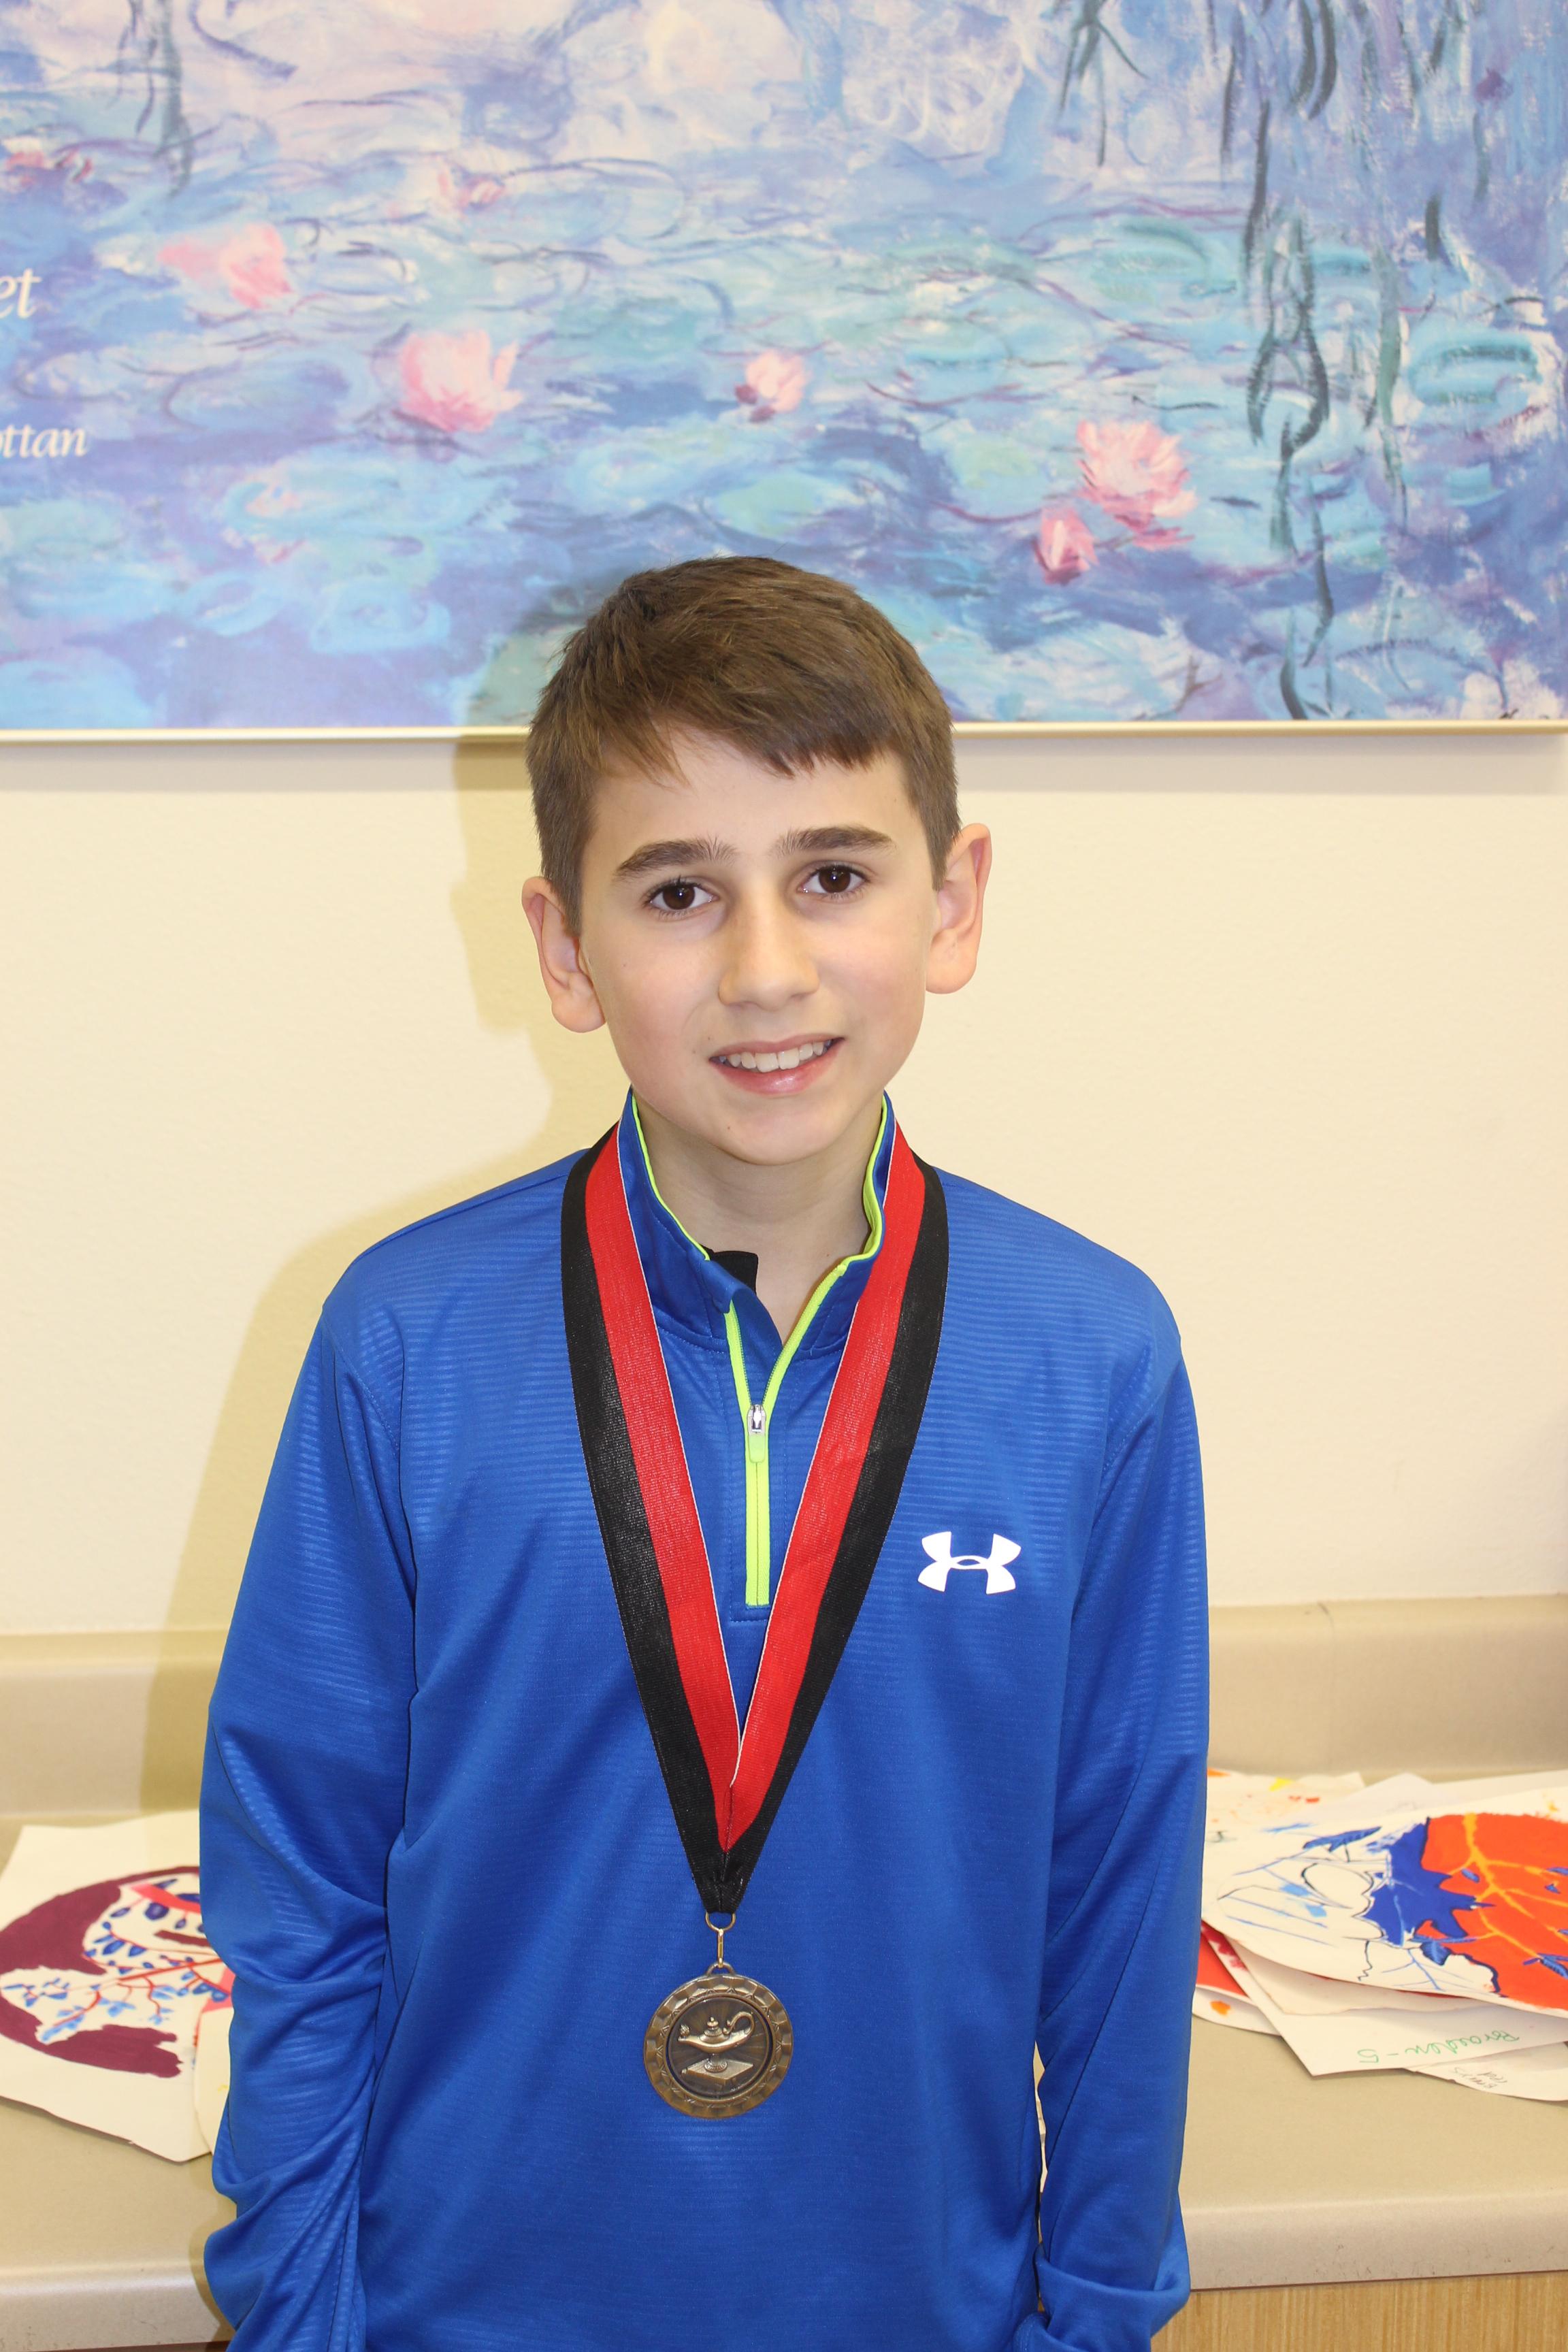 LTMS 6th grader Colin Miller